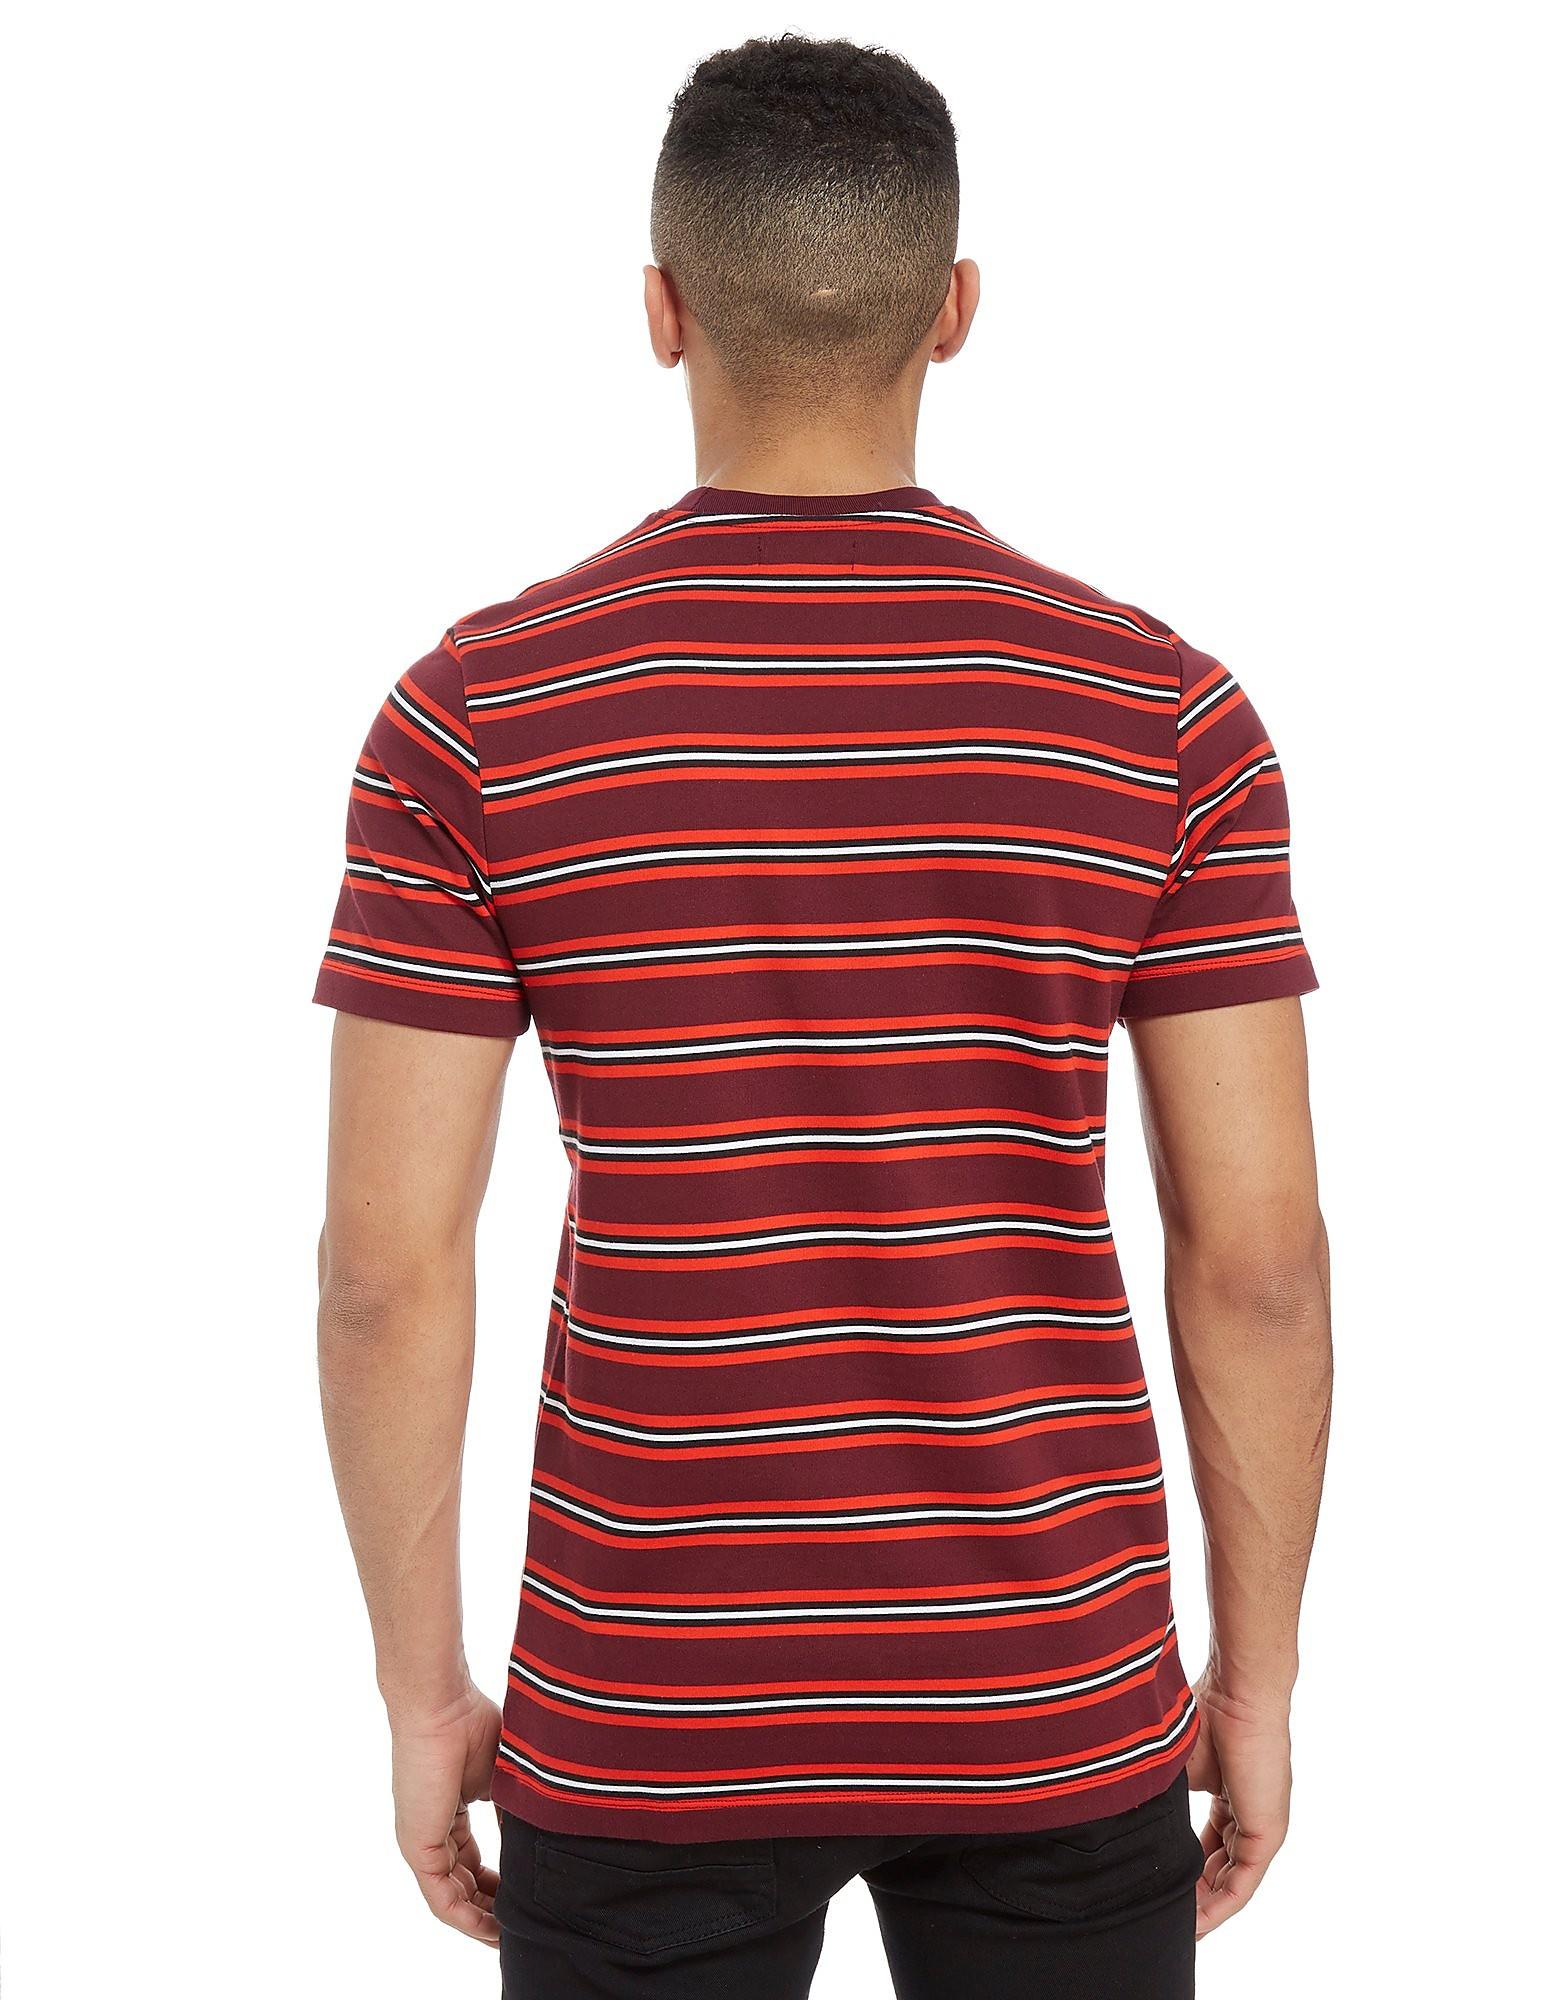 adidas Originals St Peter Stripe T-Shirt